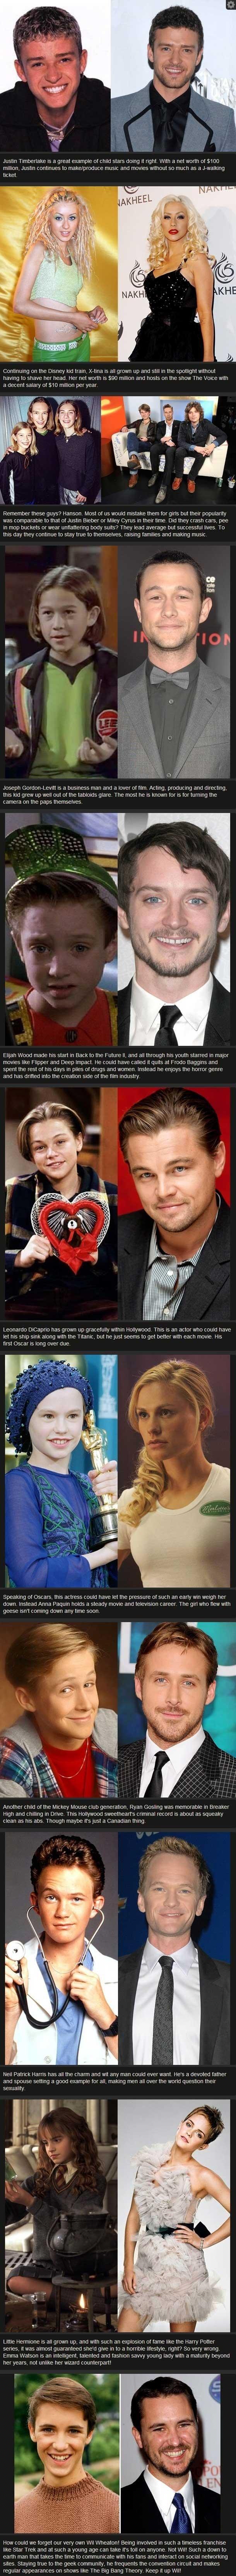 celebrities then and now.jpg